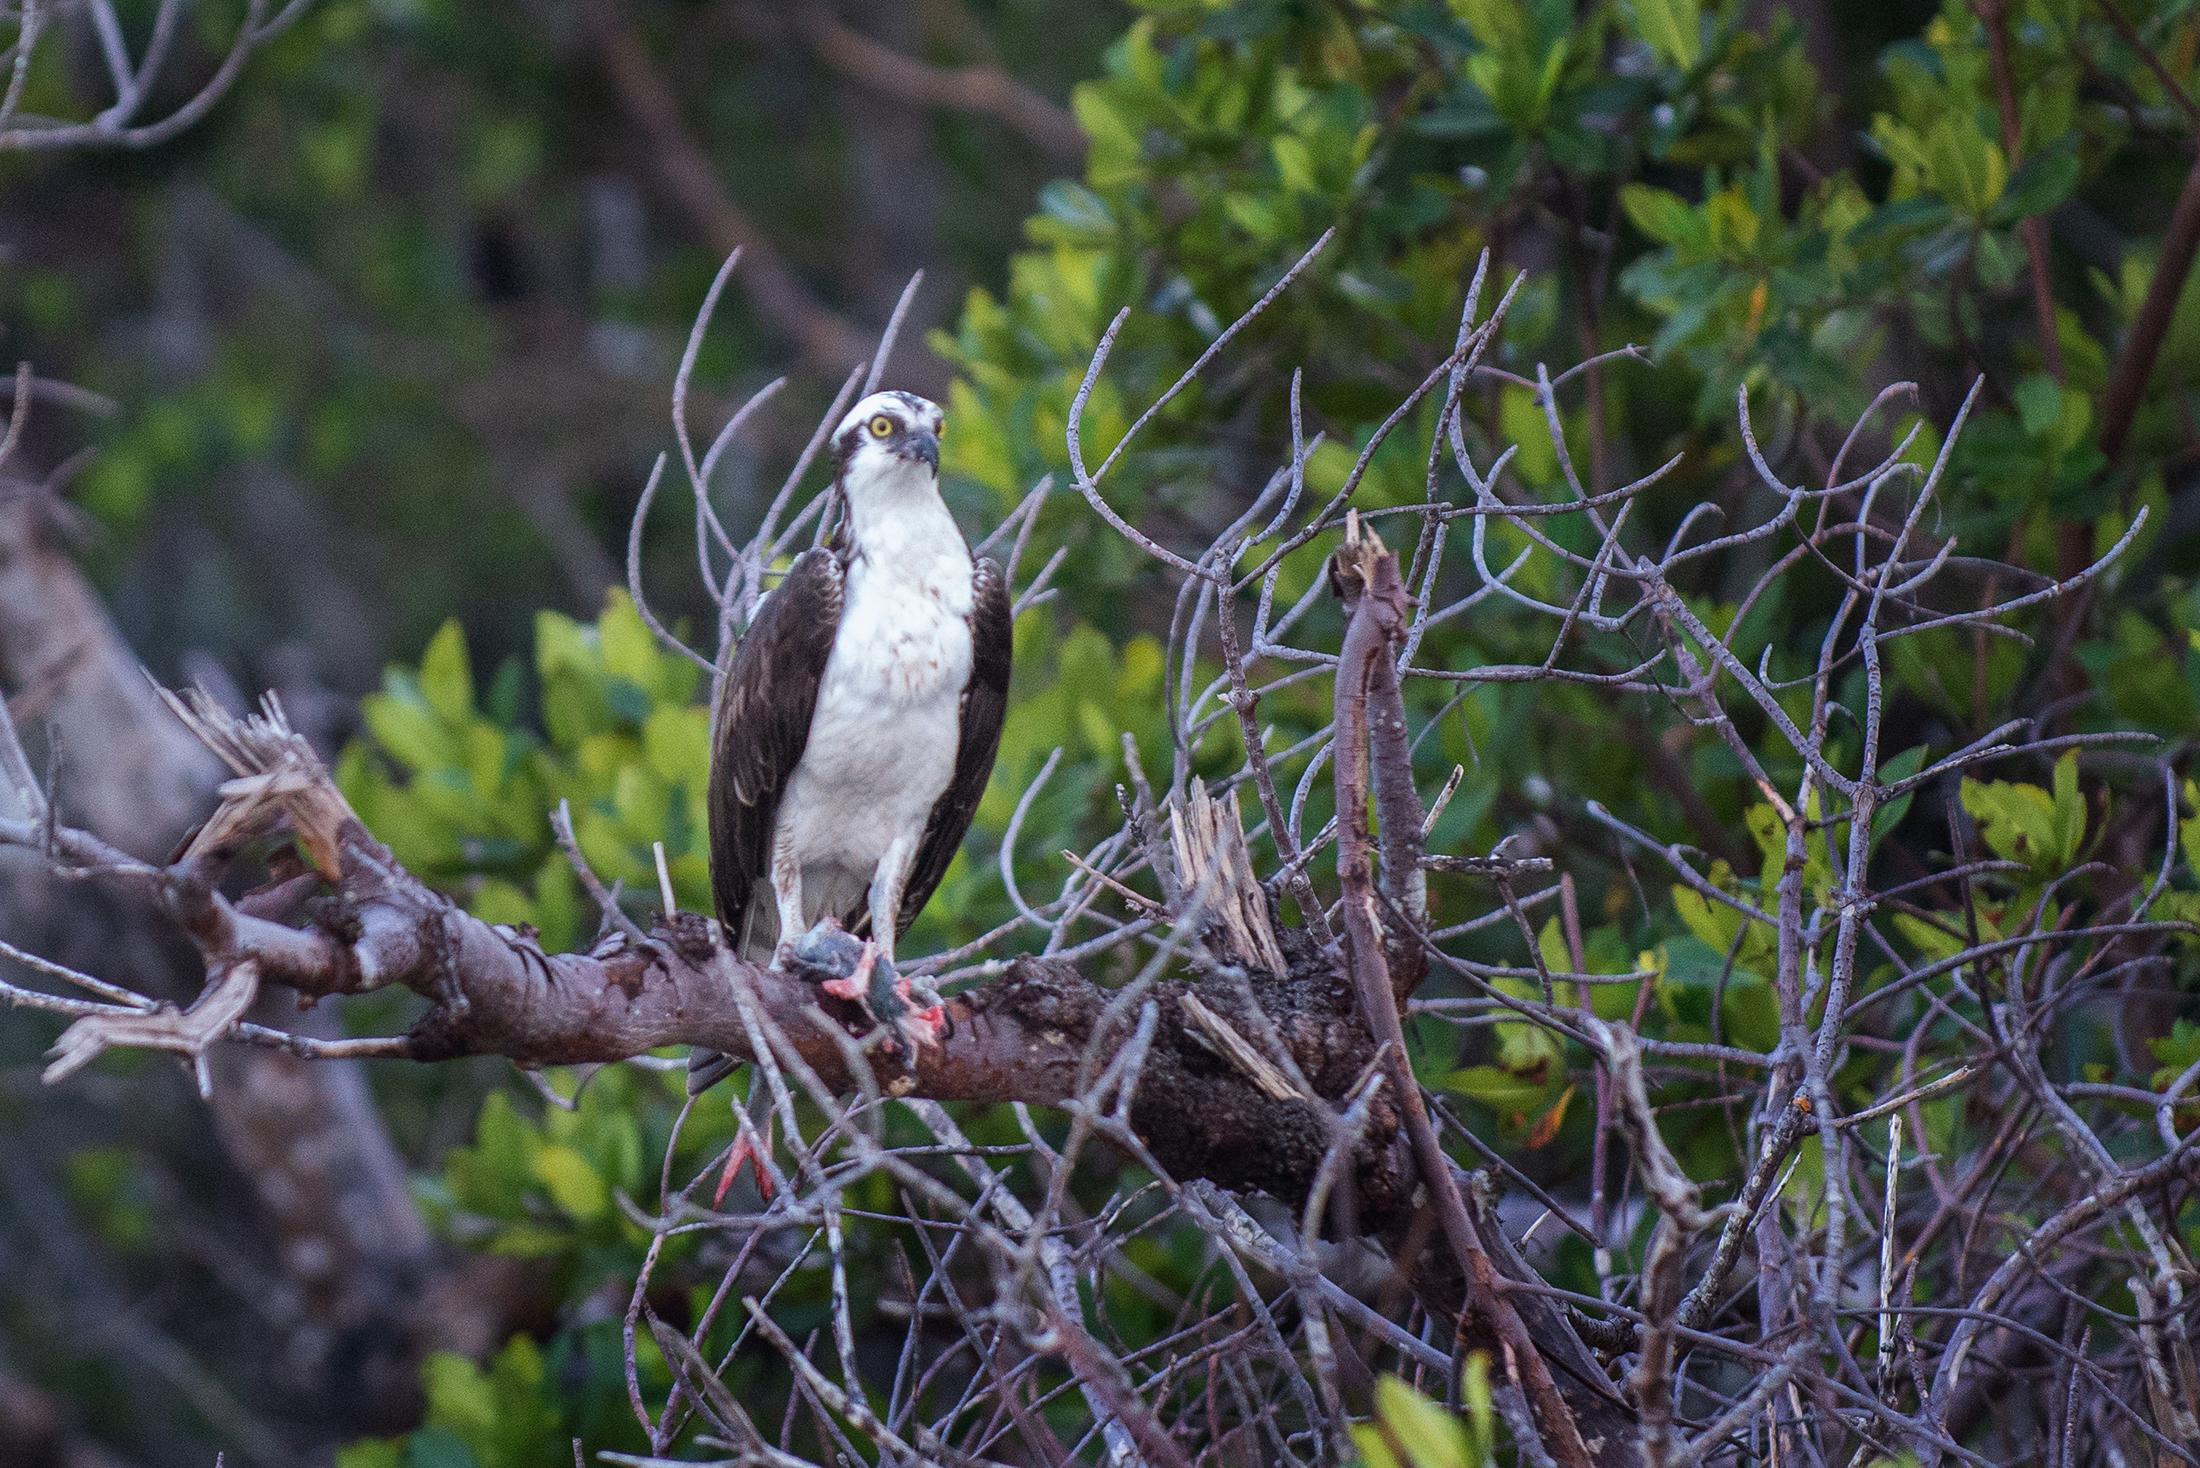 #osprey, #florida, #rookerybay, #southwestconservancy, #ecocruise, #prey, #fish, #raptor, #naples, #nikon